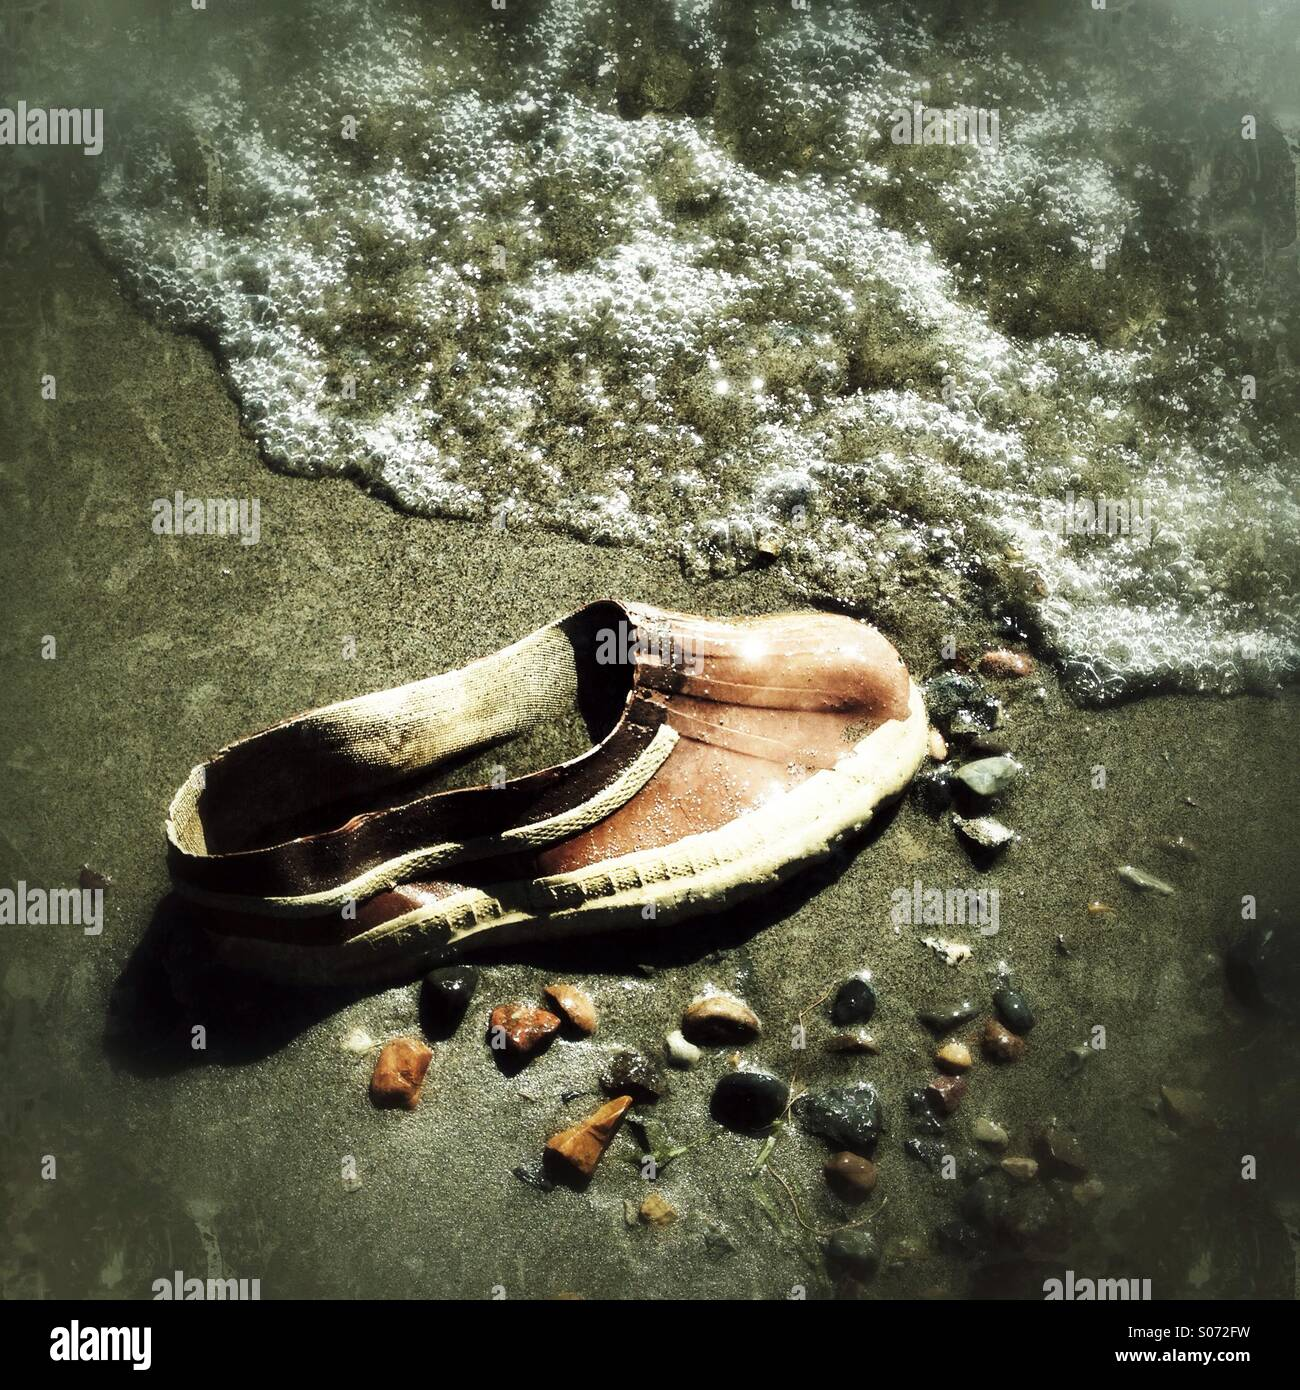 Shoe - Stock Image